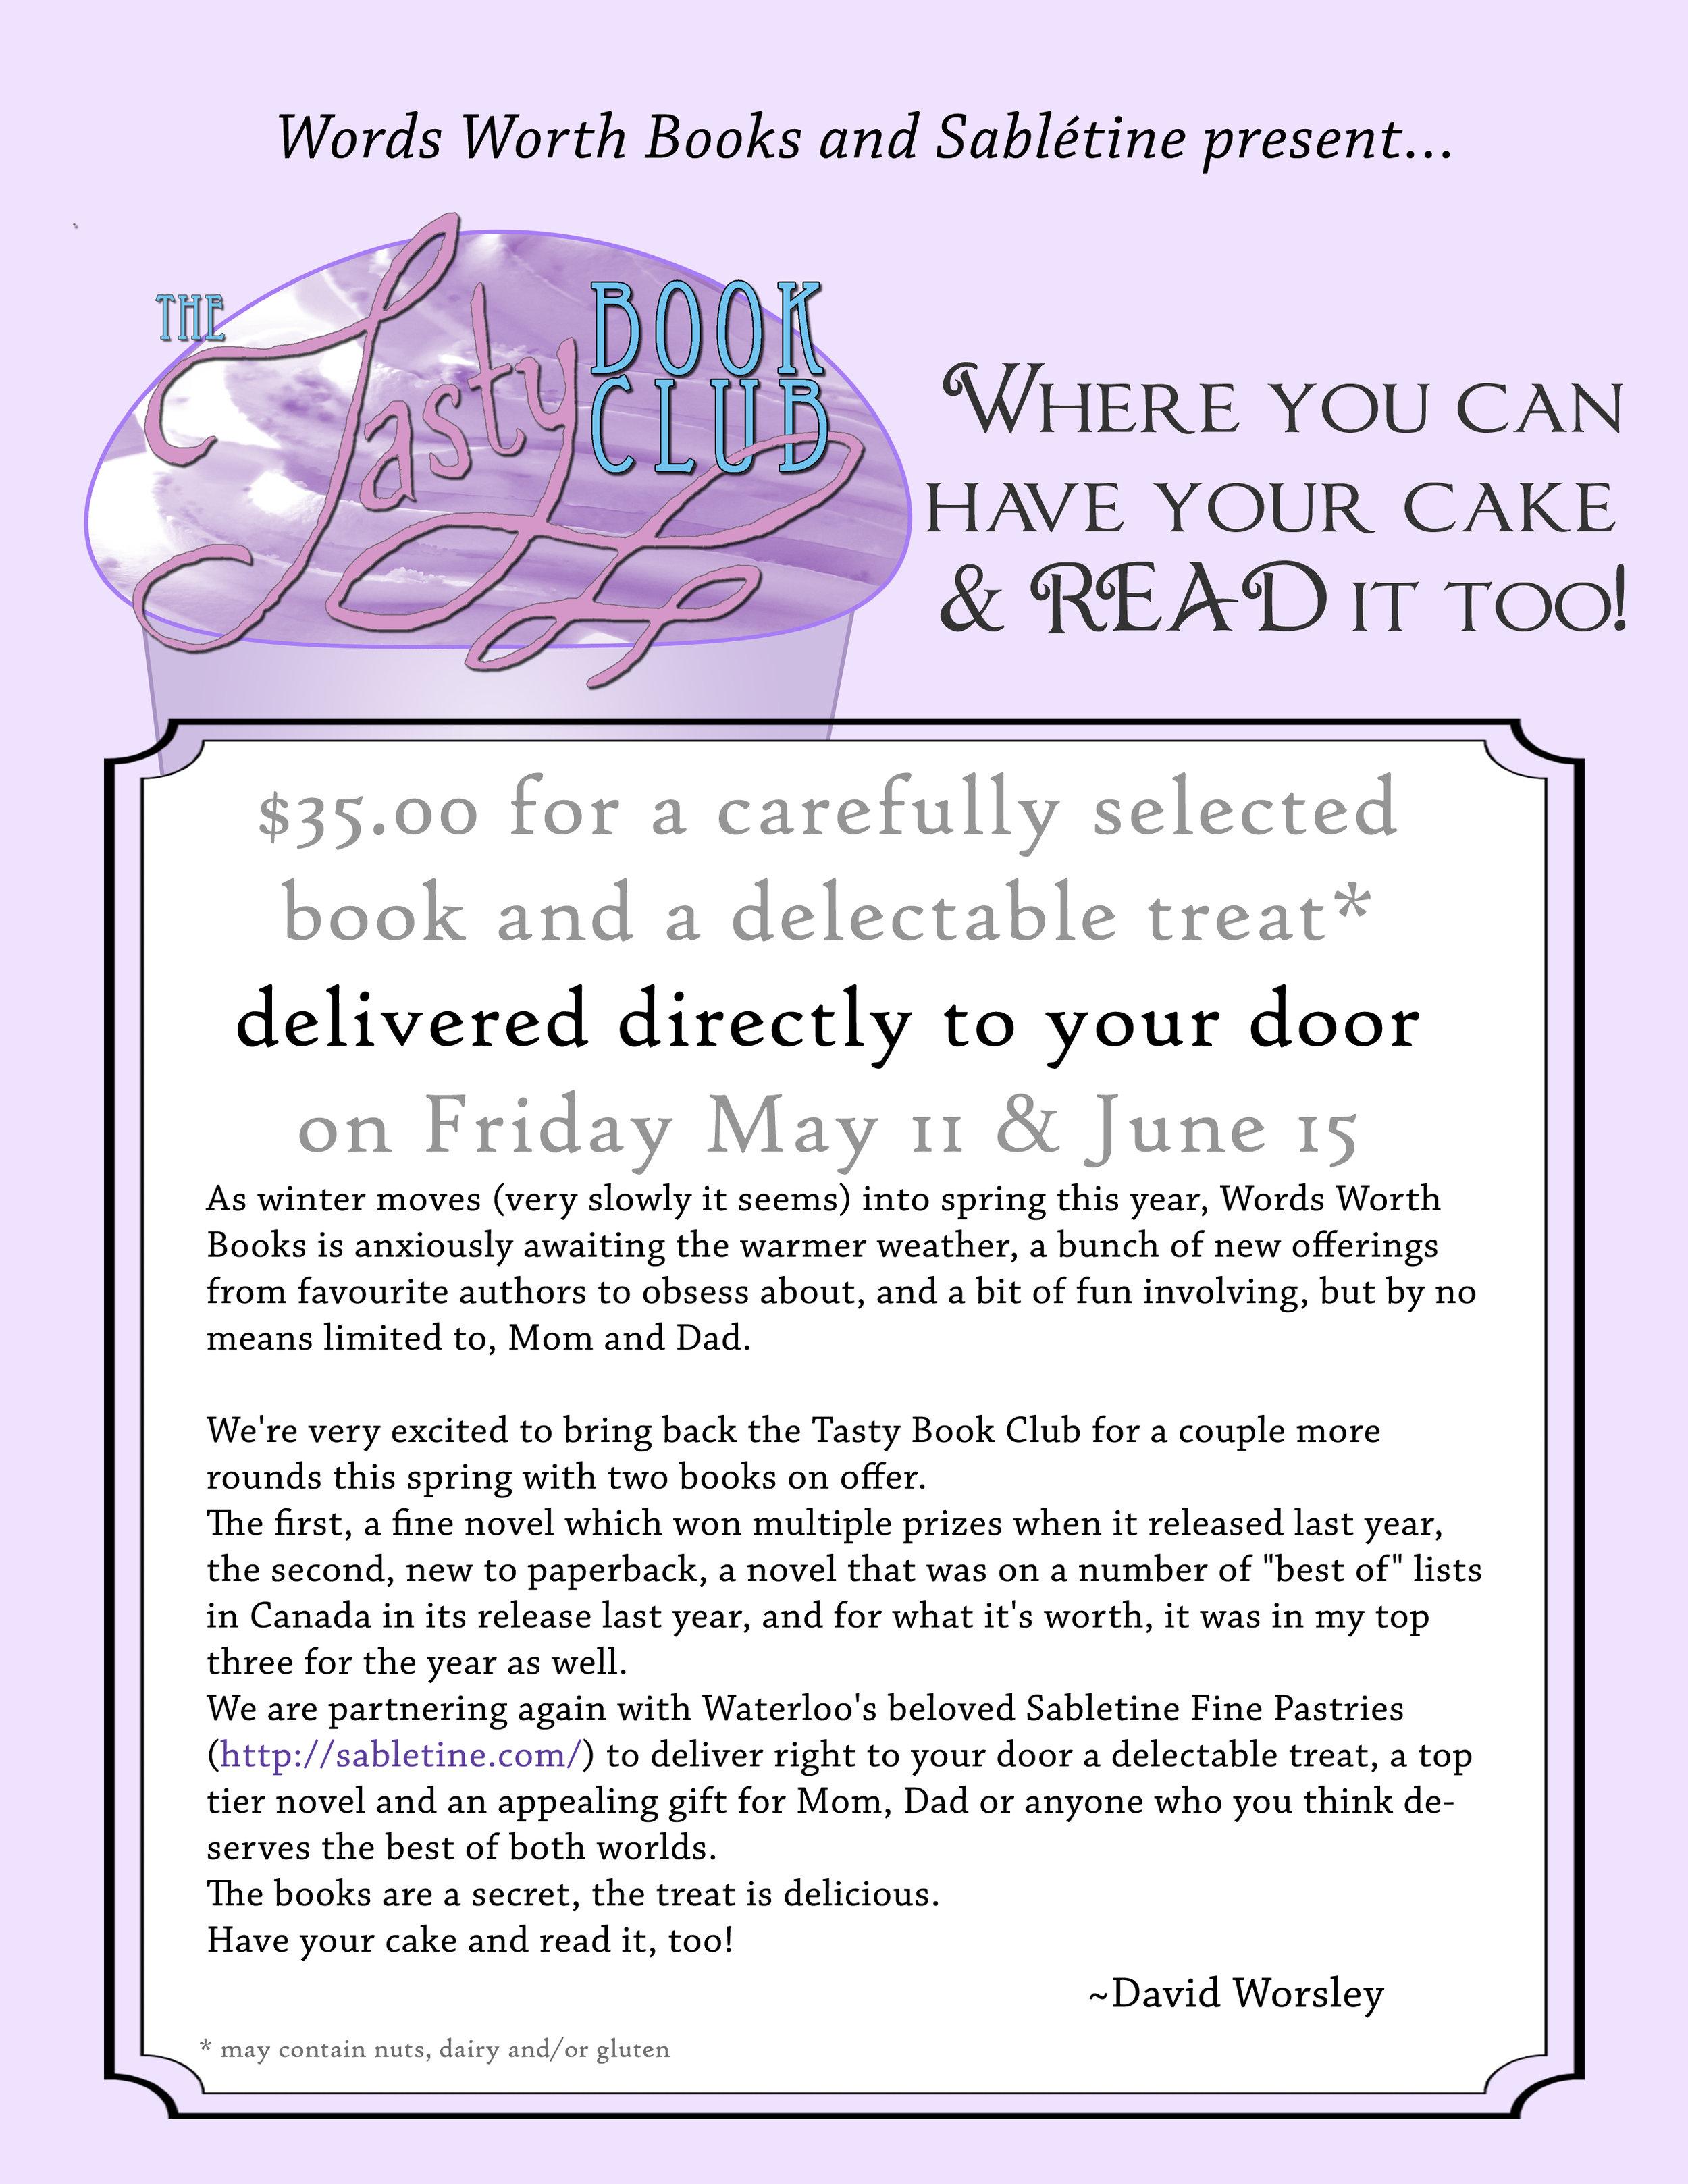 Tasty Book Club Poster 2018 2.jpg